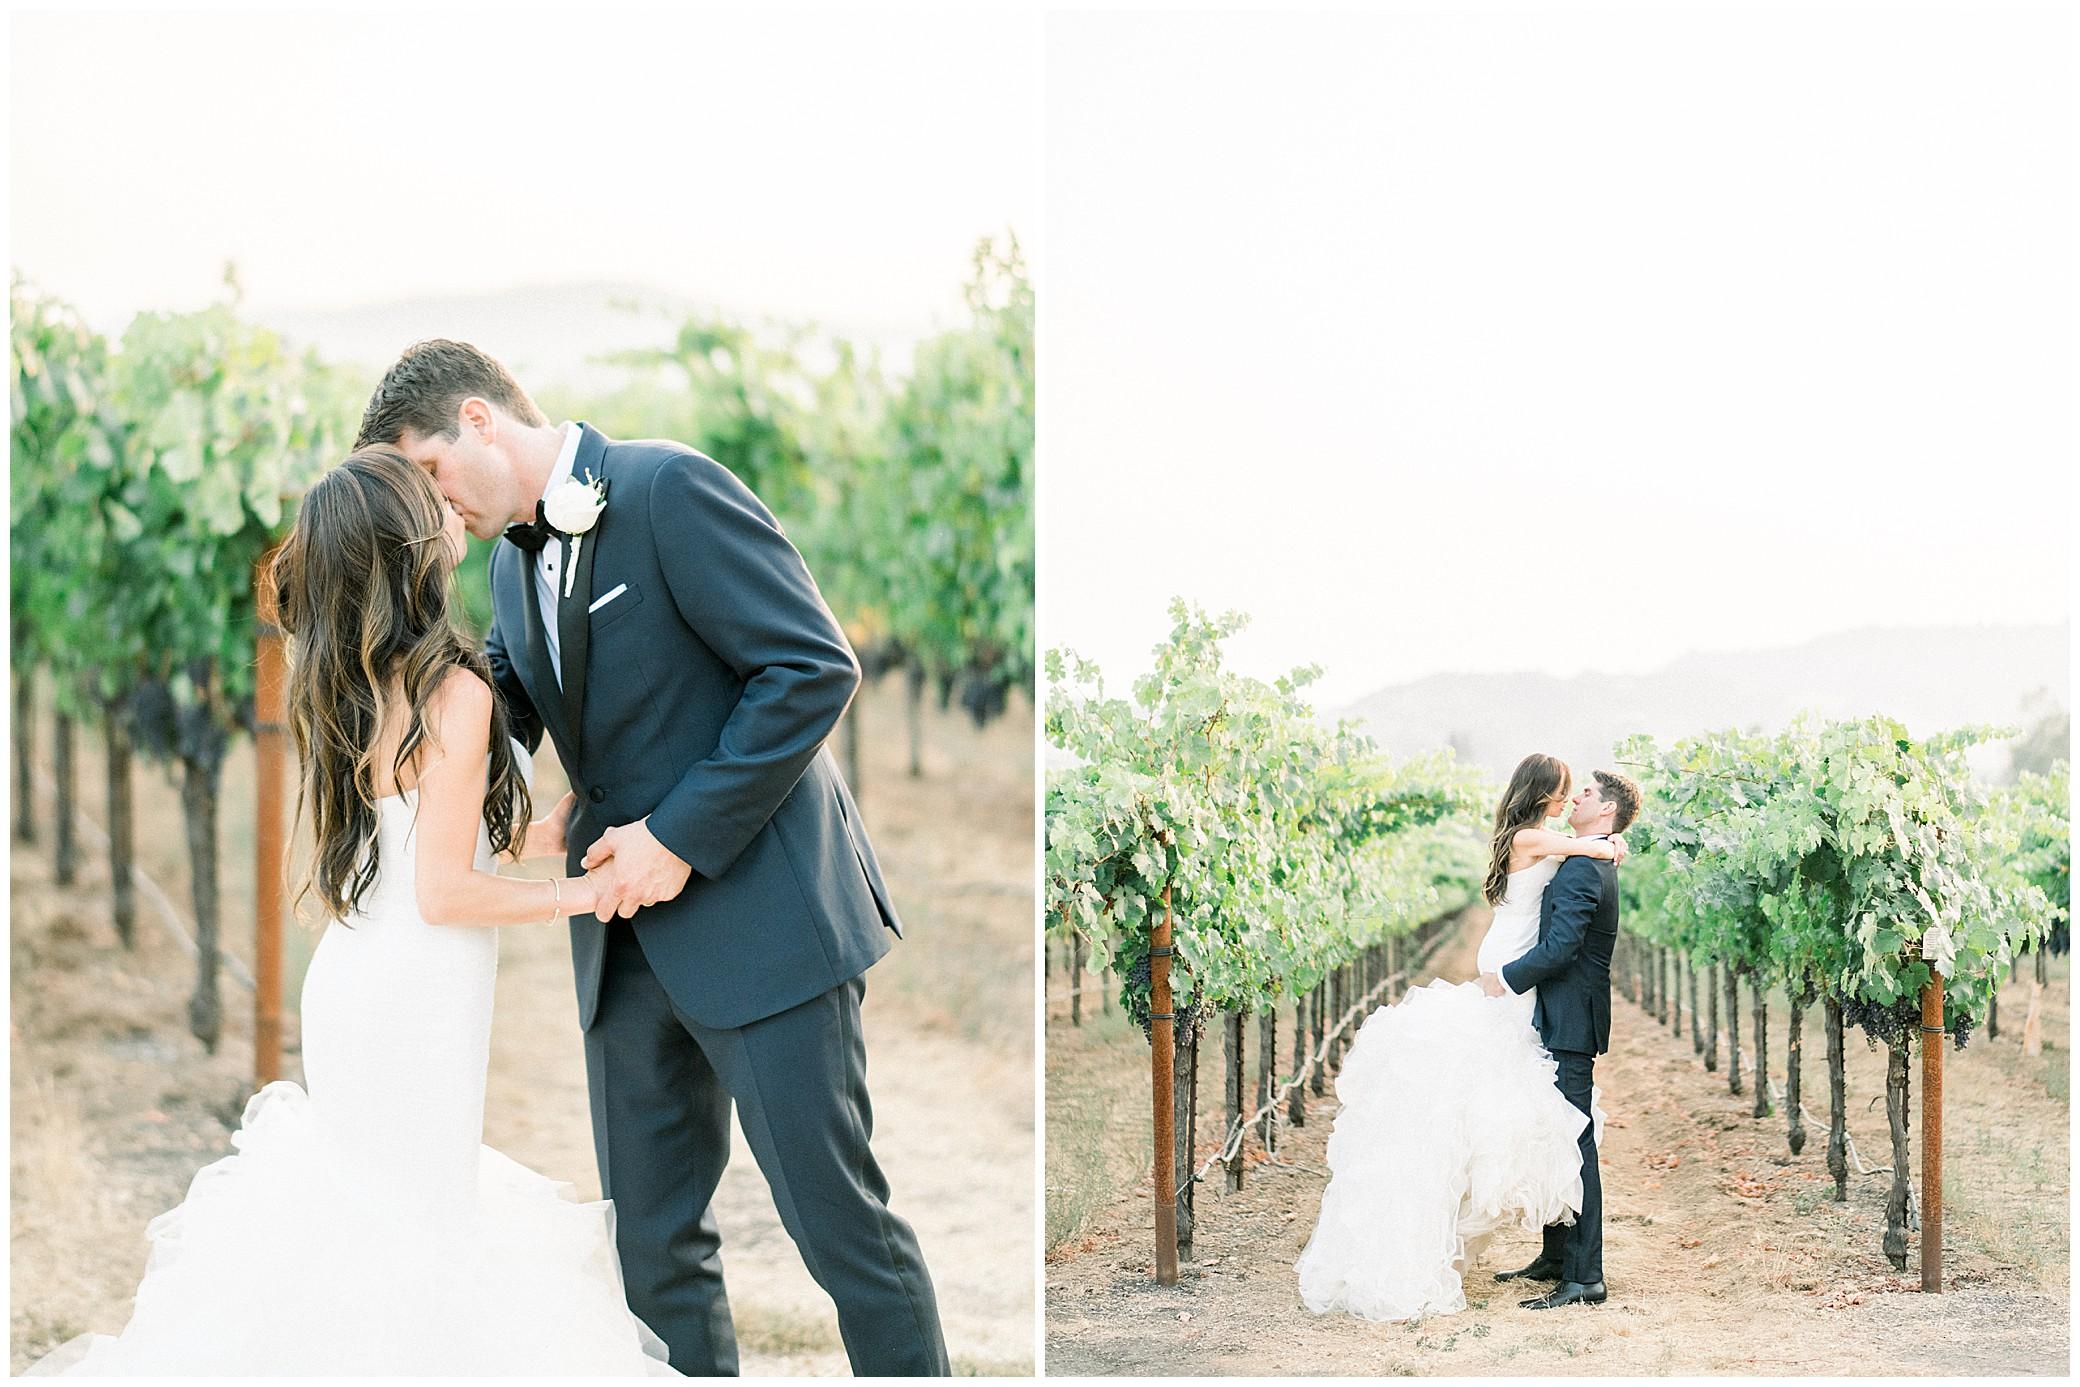 sonoma vineyard winery wedding photographer